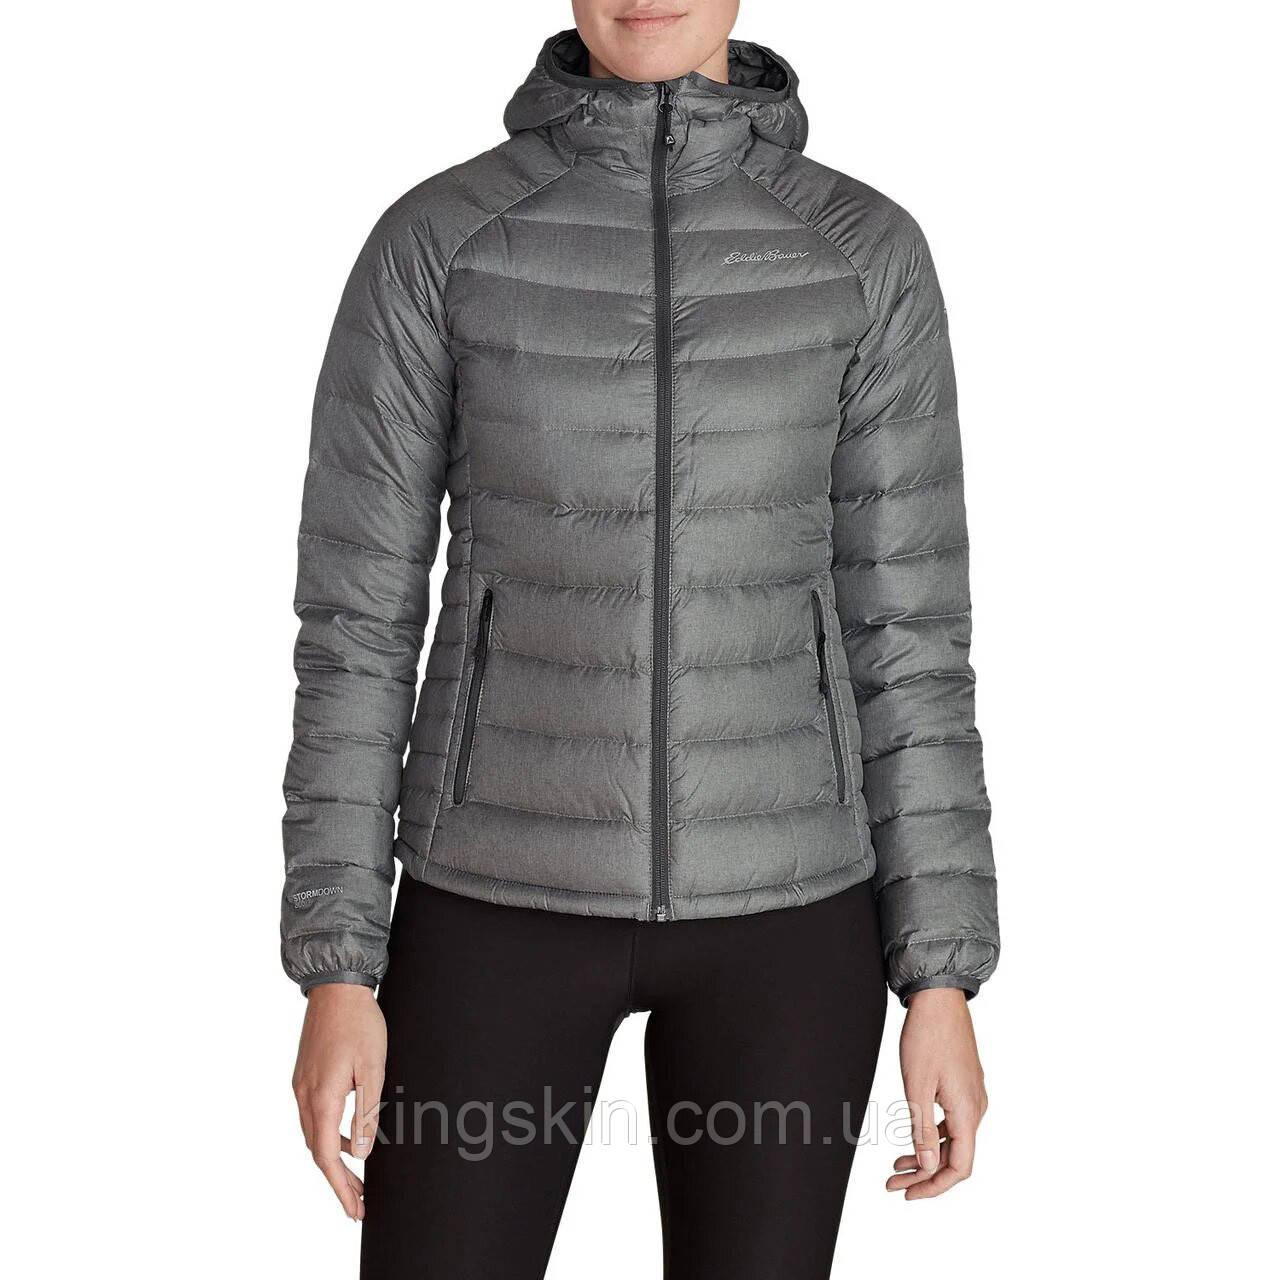 Куртка Eddie Bauer Womens Downlight StormDown Hooded Jacket DK SMOKE  HTR S Серый (1074DSMH)